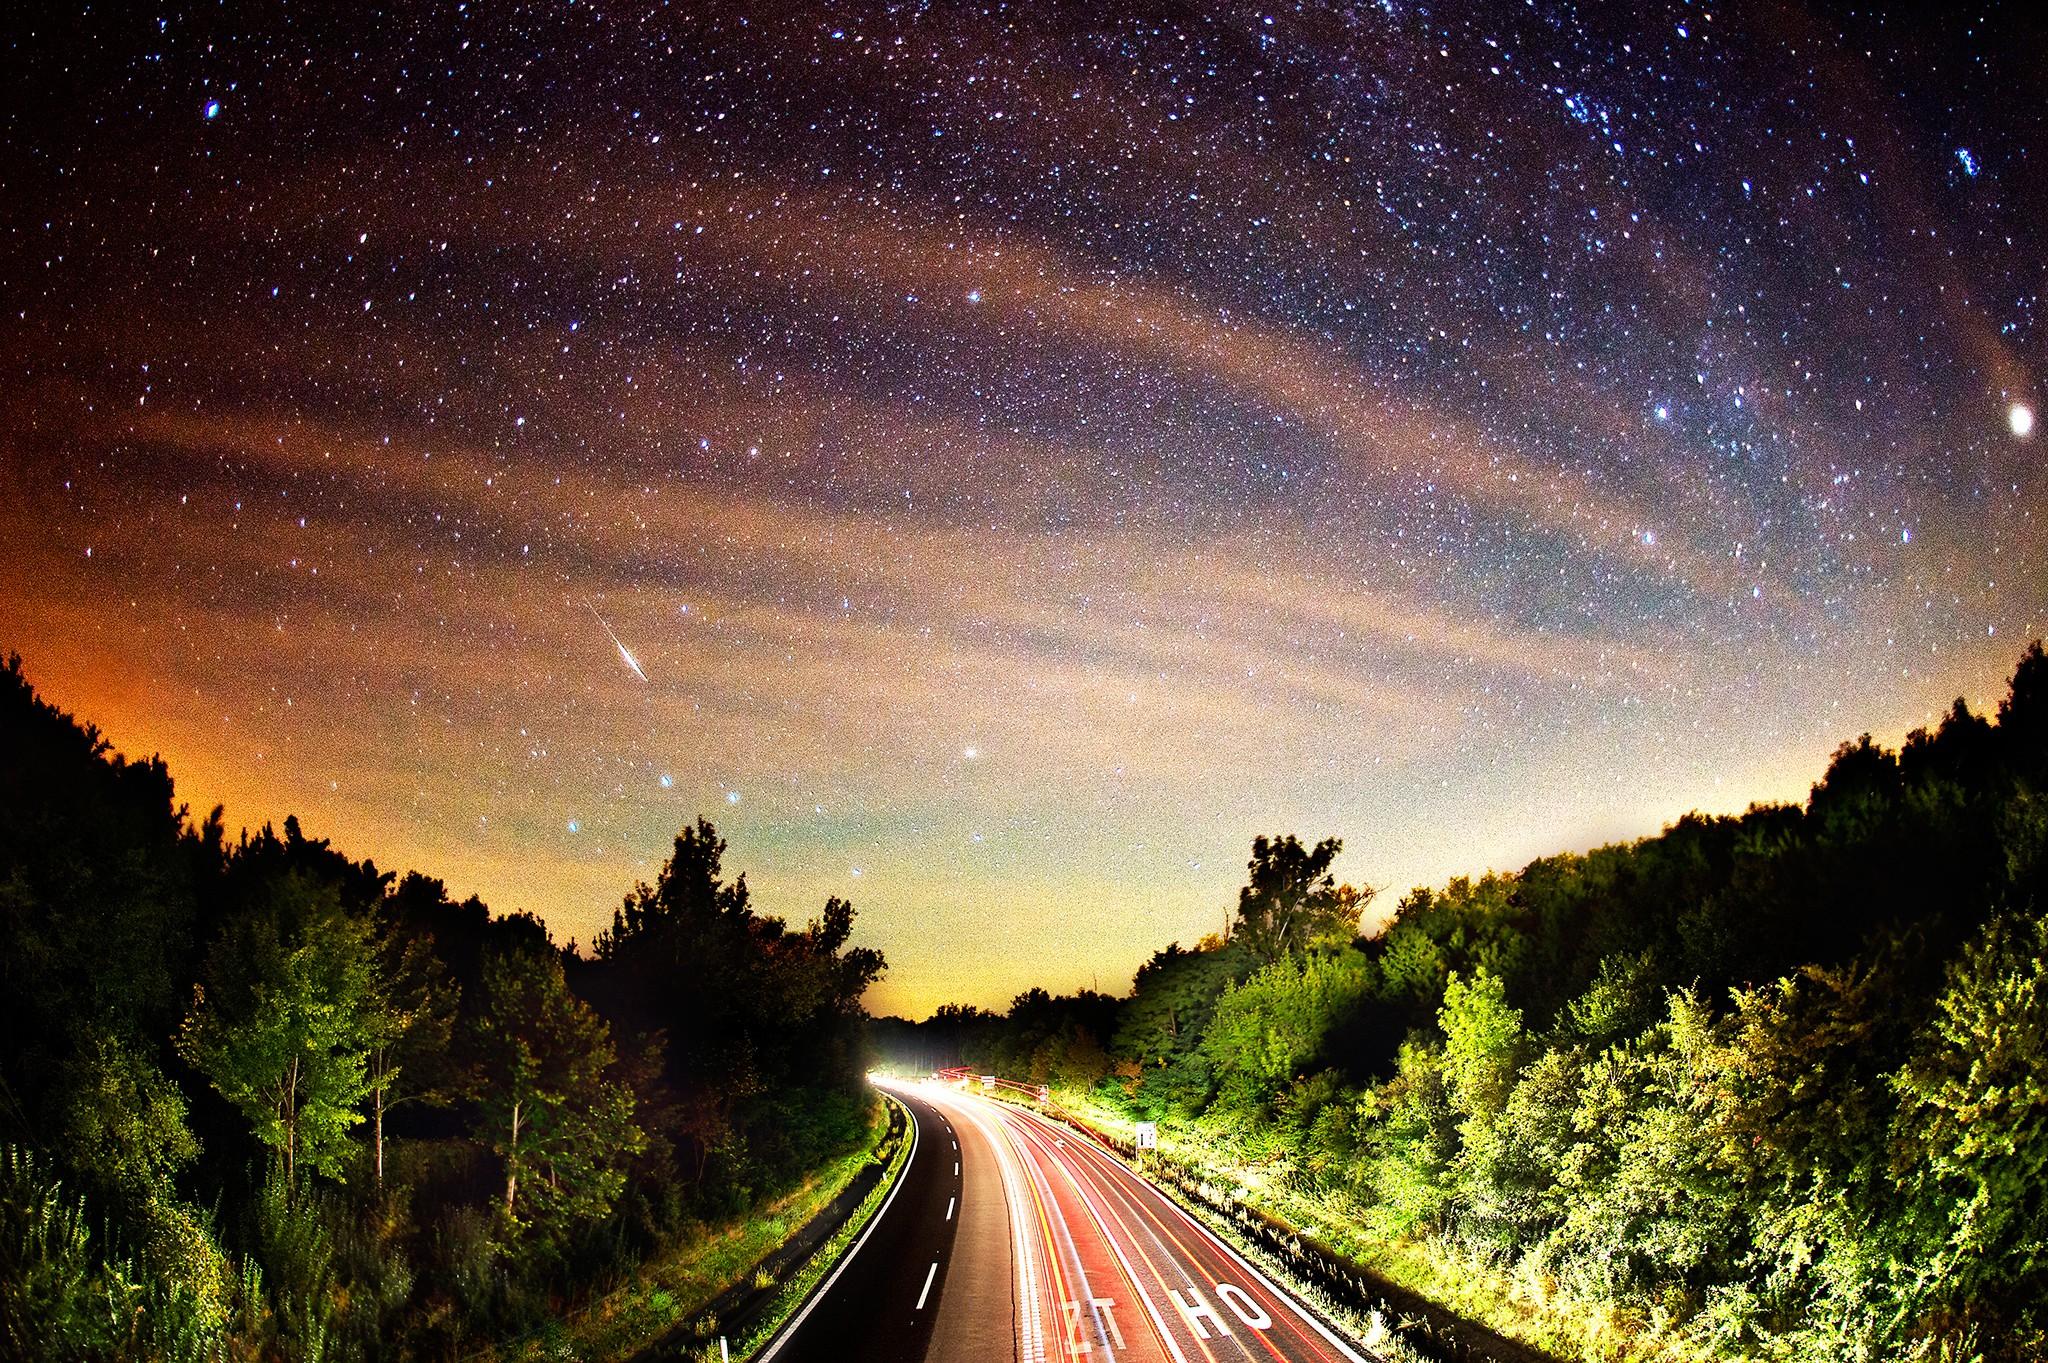 Perseid meteor // Gneixendorf, Austria // 2012